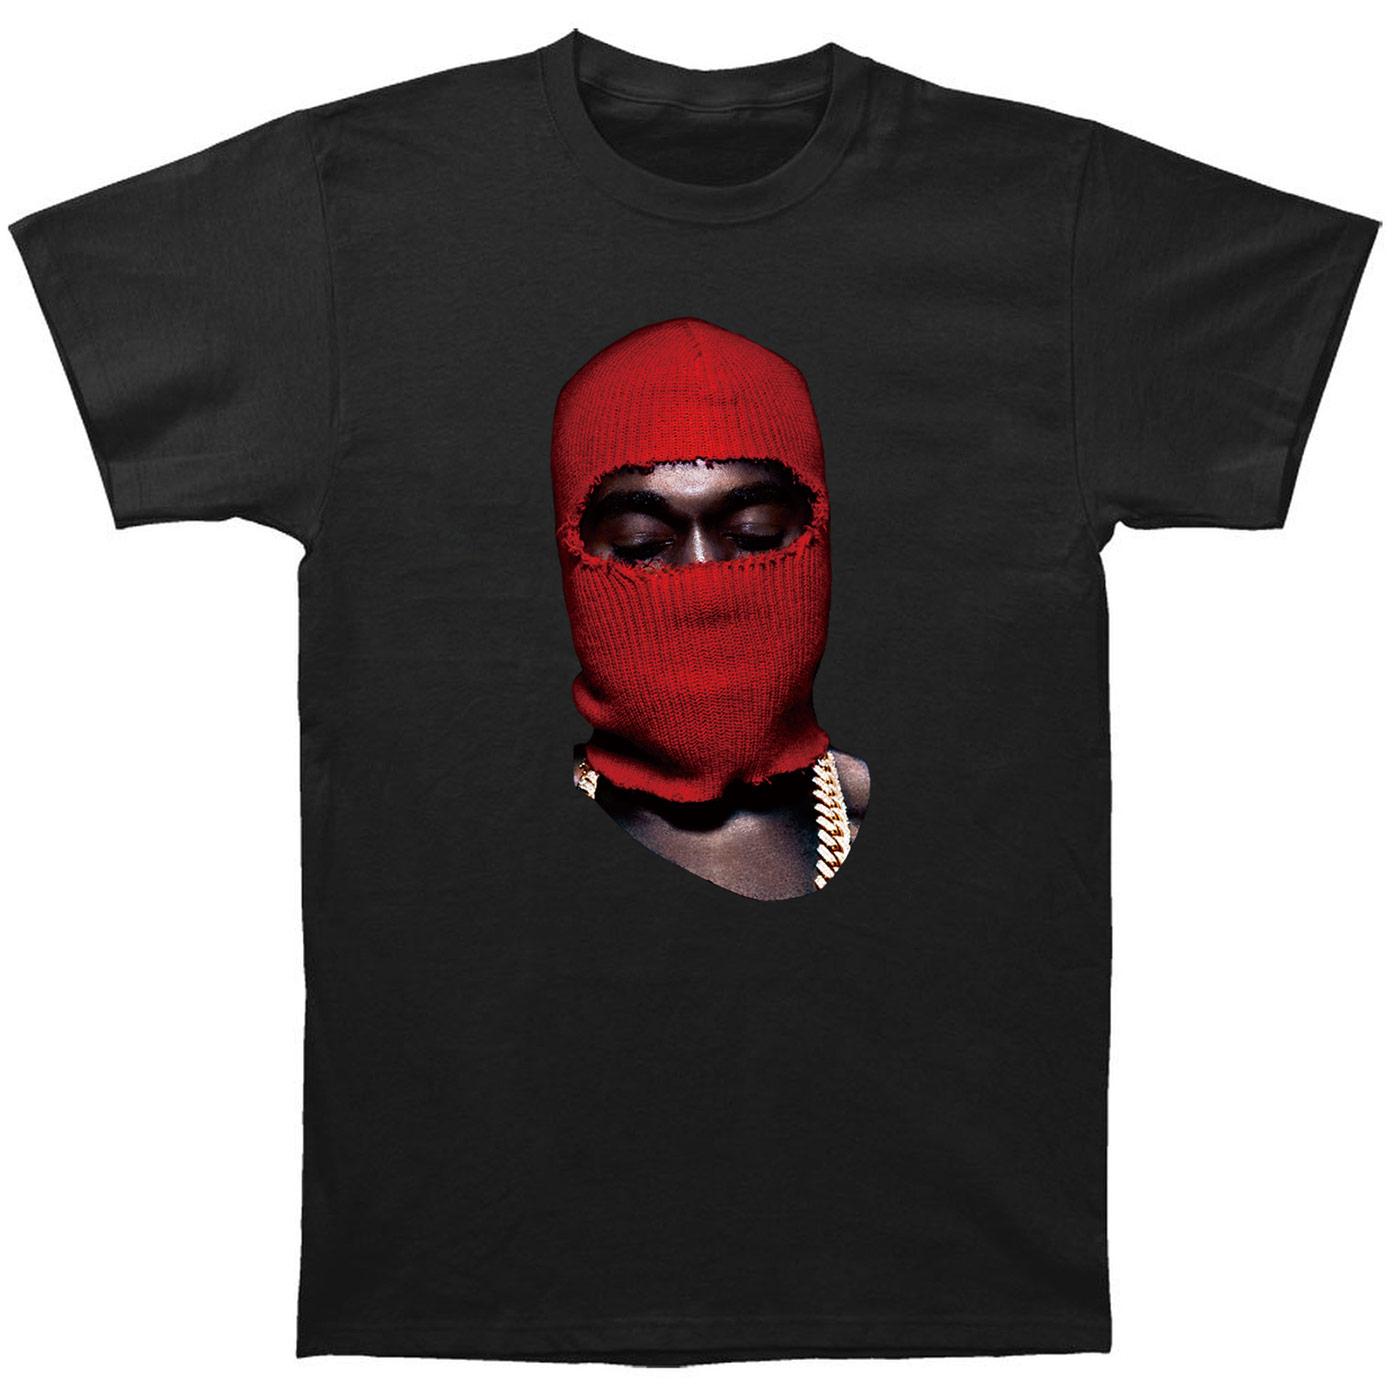 Kanye West Red Ski Mask Yeezus Vinyl Cd Shoes Poster Apc Water Black T Shirt(China (Mainland))